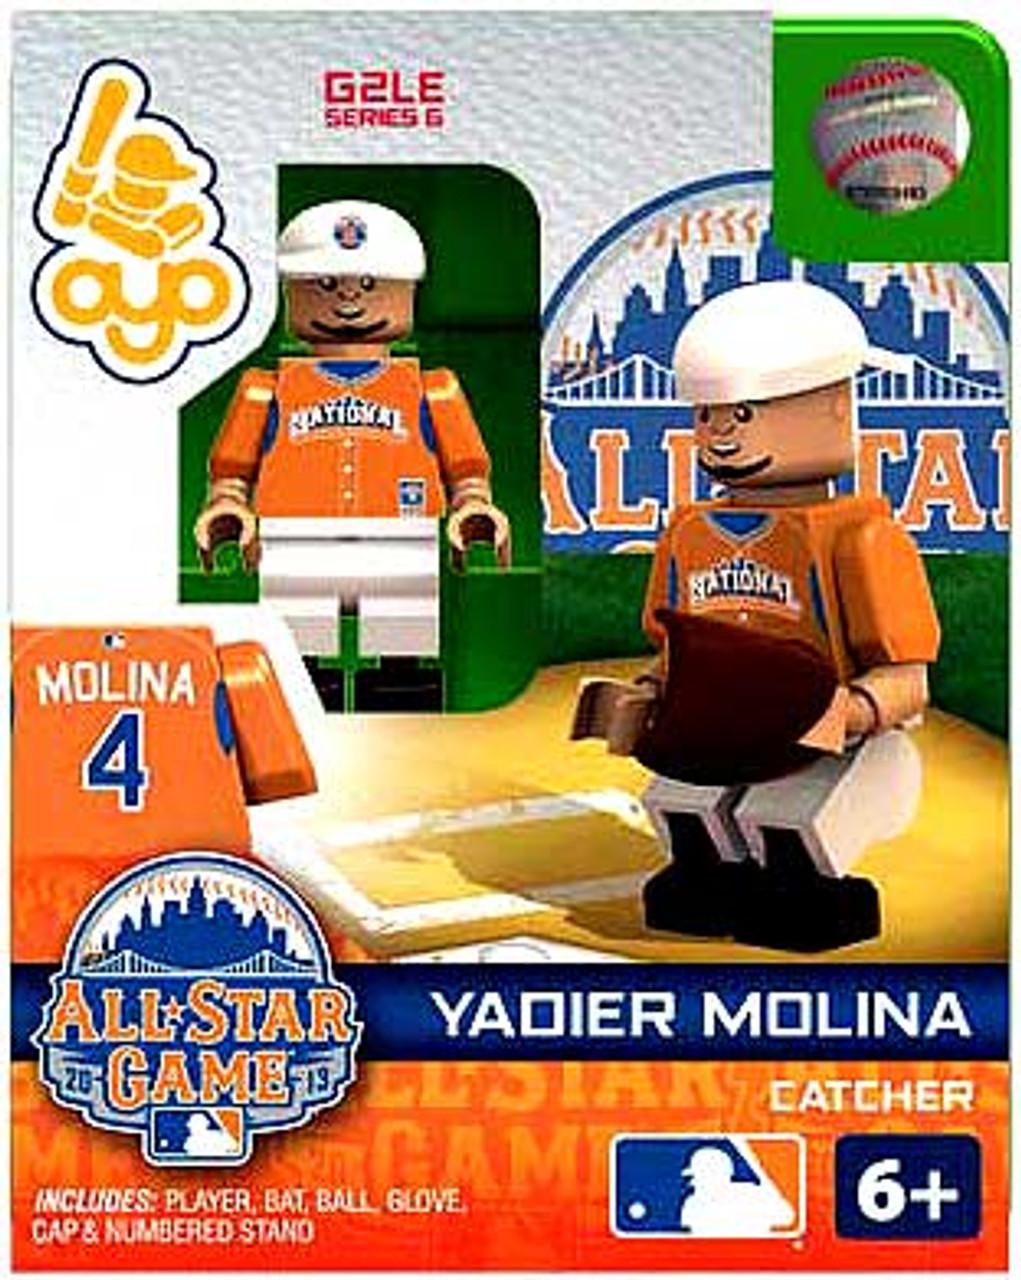 National League MLB Generation 2 Series 6 Yadier Molina Minifigure [All-Star Game]